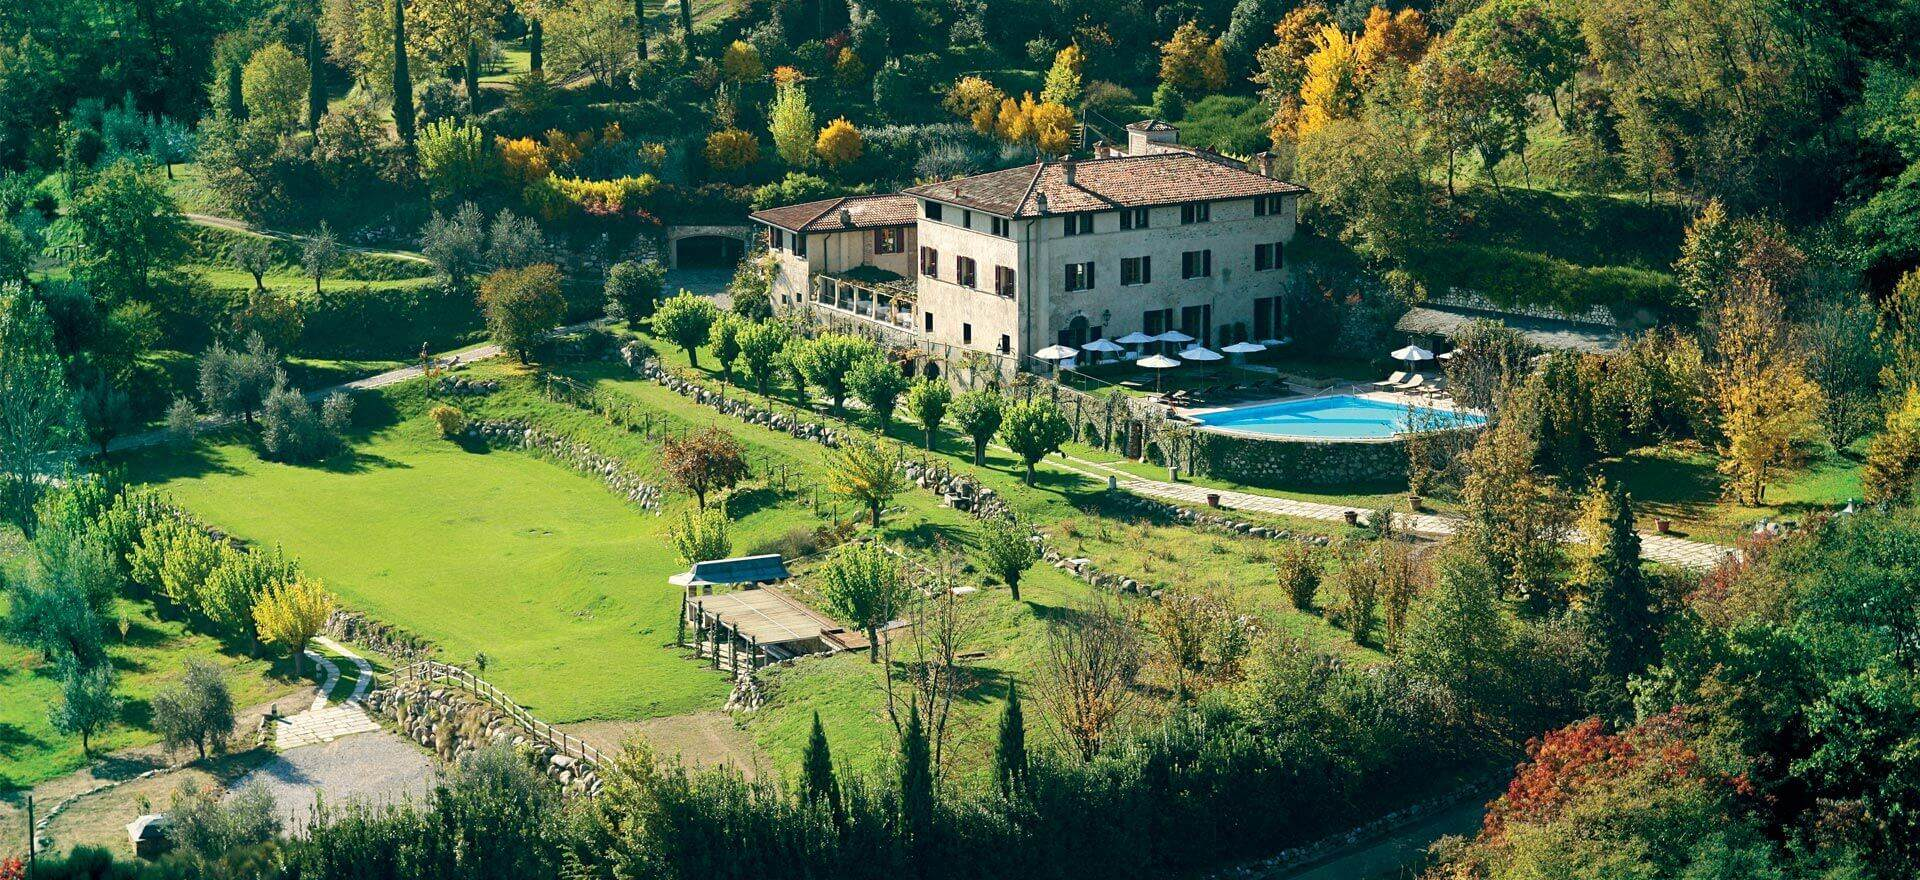 Il Resort - Hotel Villa Arcadio - Salò